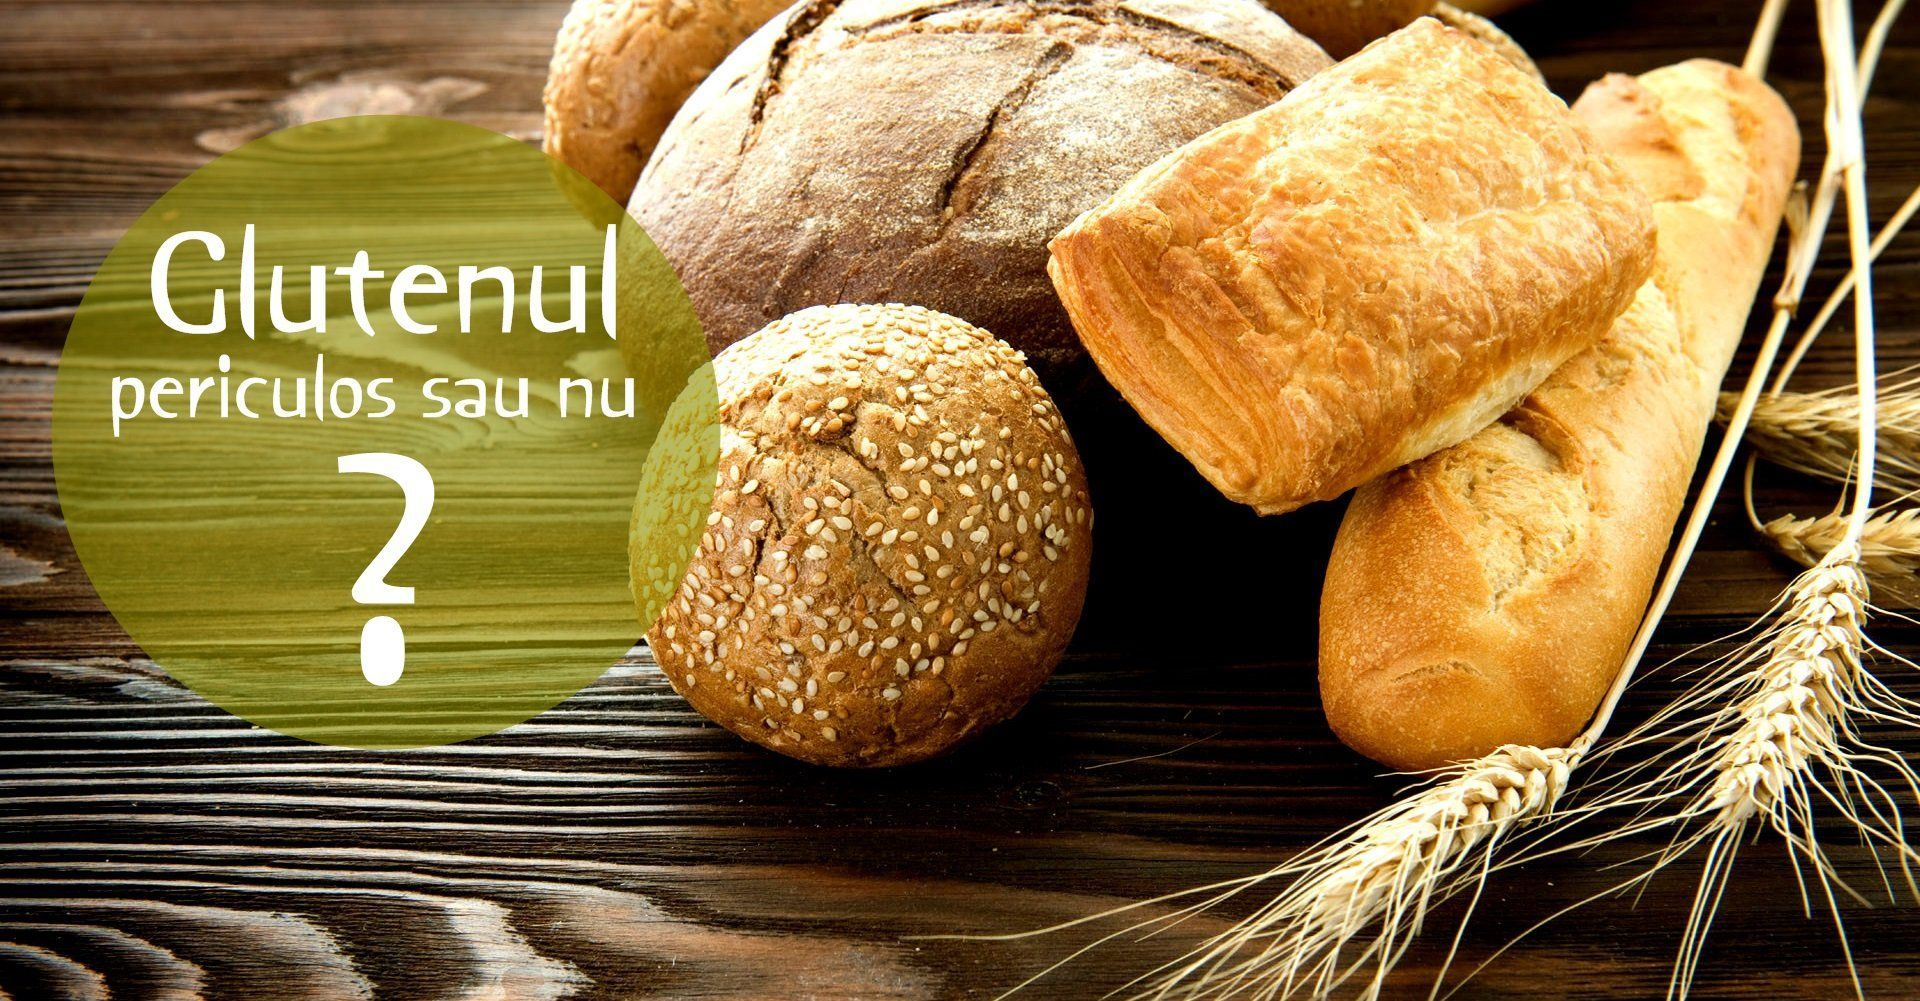 glutenul- un pericol pentru sanatate